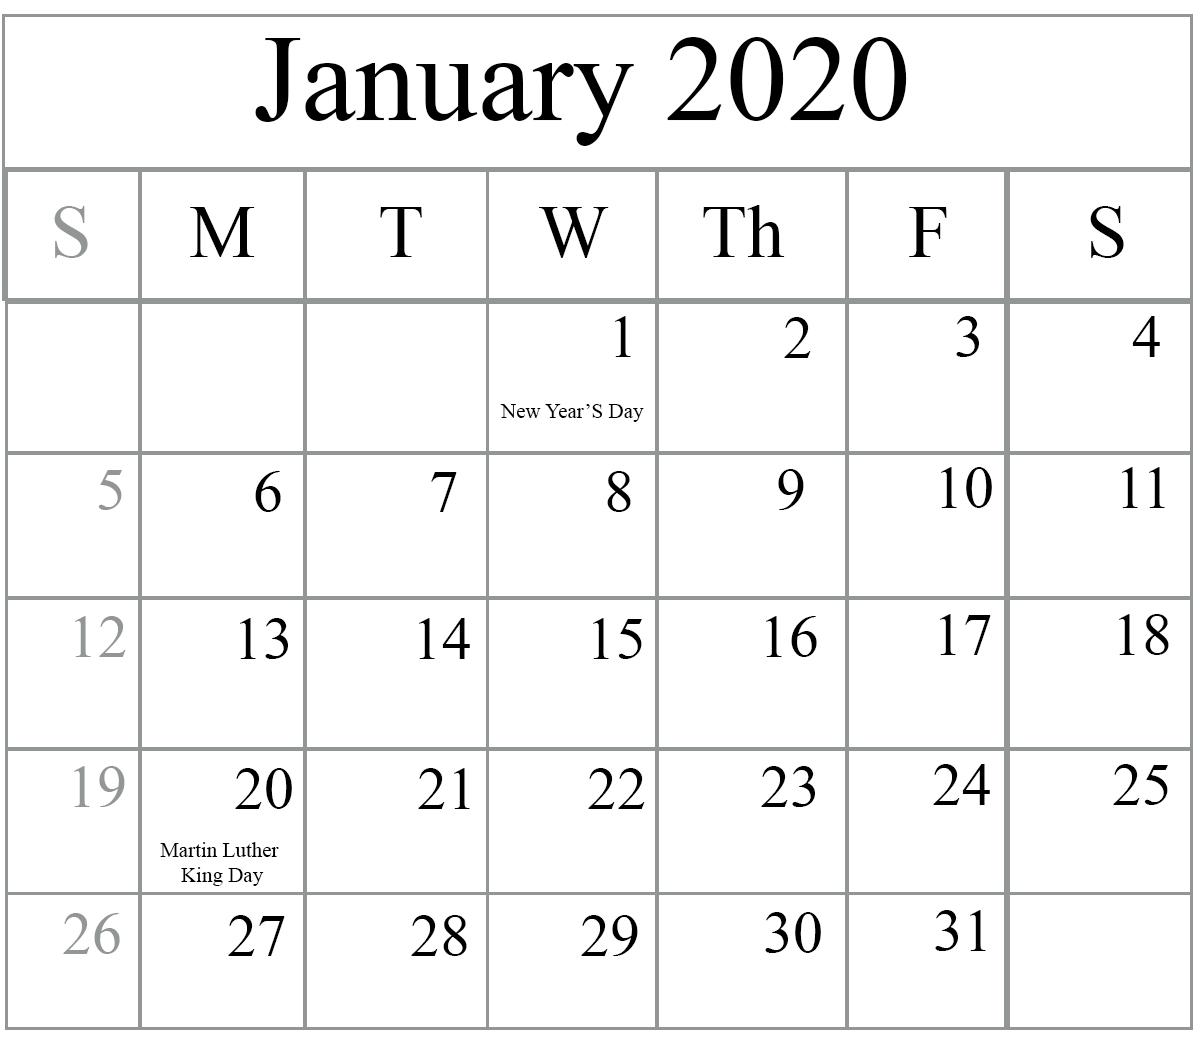 January 2020 Calendar Pdf | Free Printable Calendar